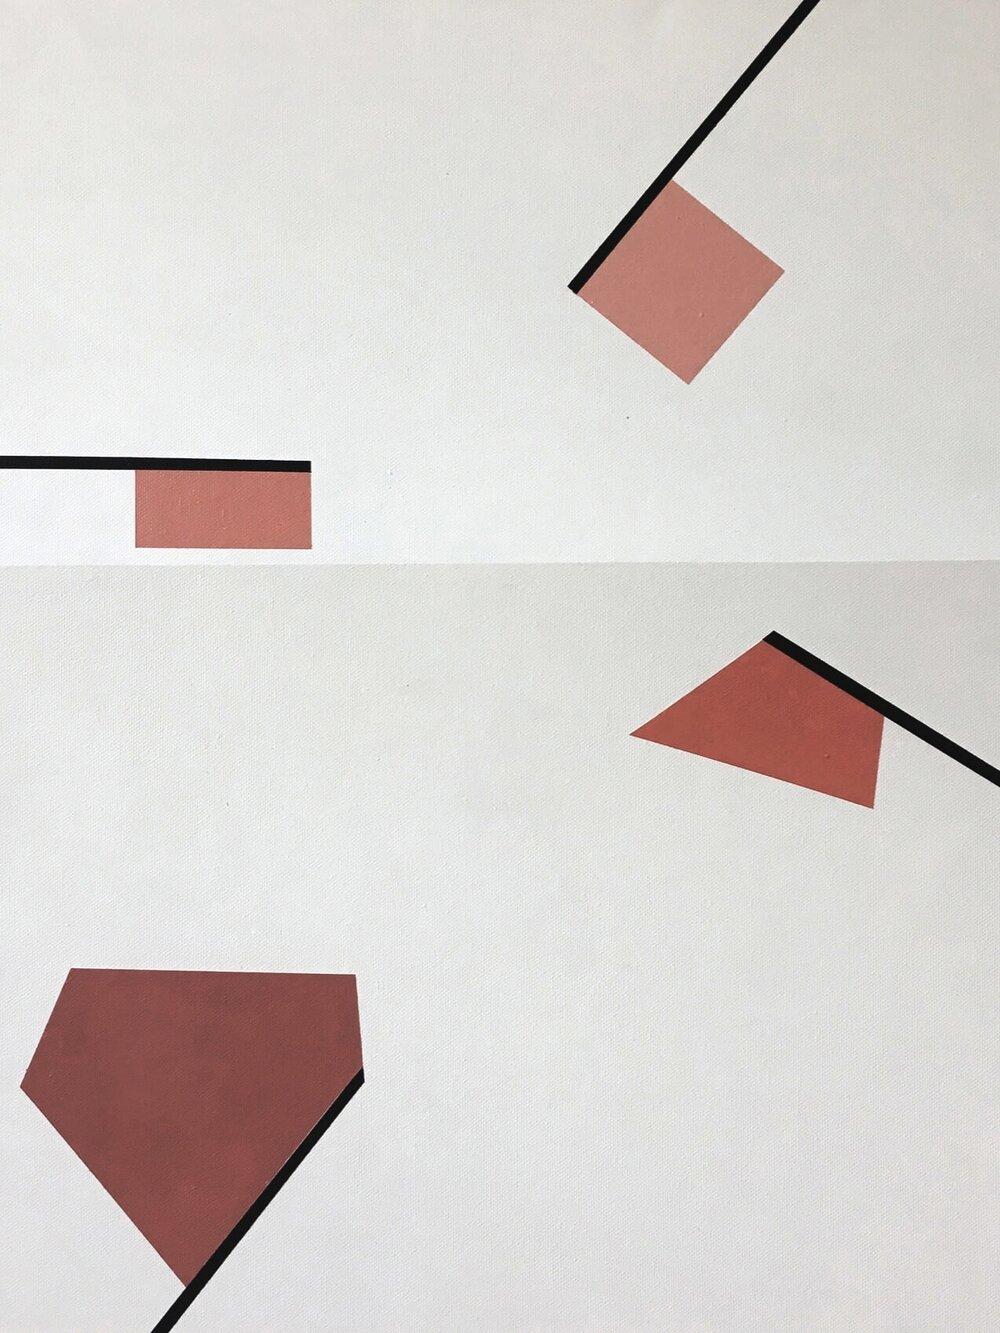 Minimal 11, 60 cm x 50 x 4cm, Acryl auf Leinwand, © Ute Latzke, 2016, Preis 300 Euro.